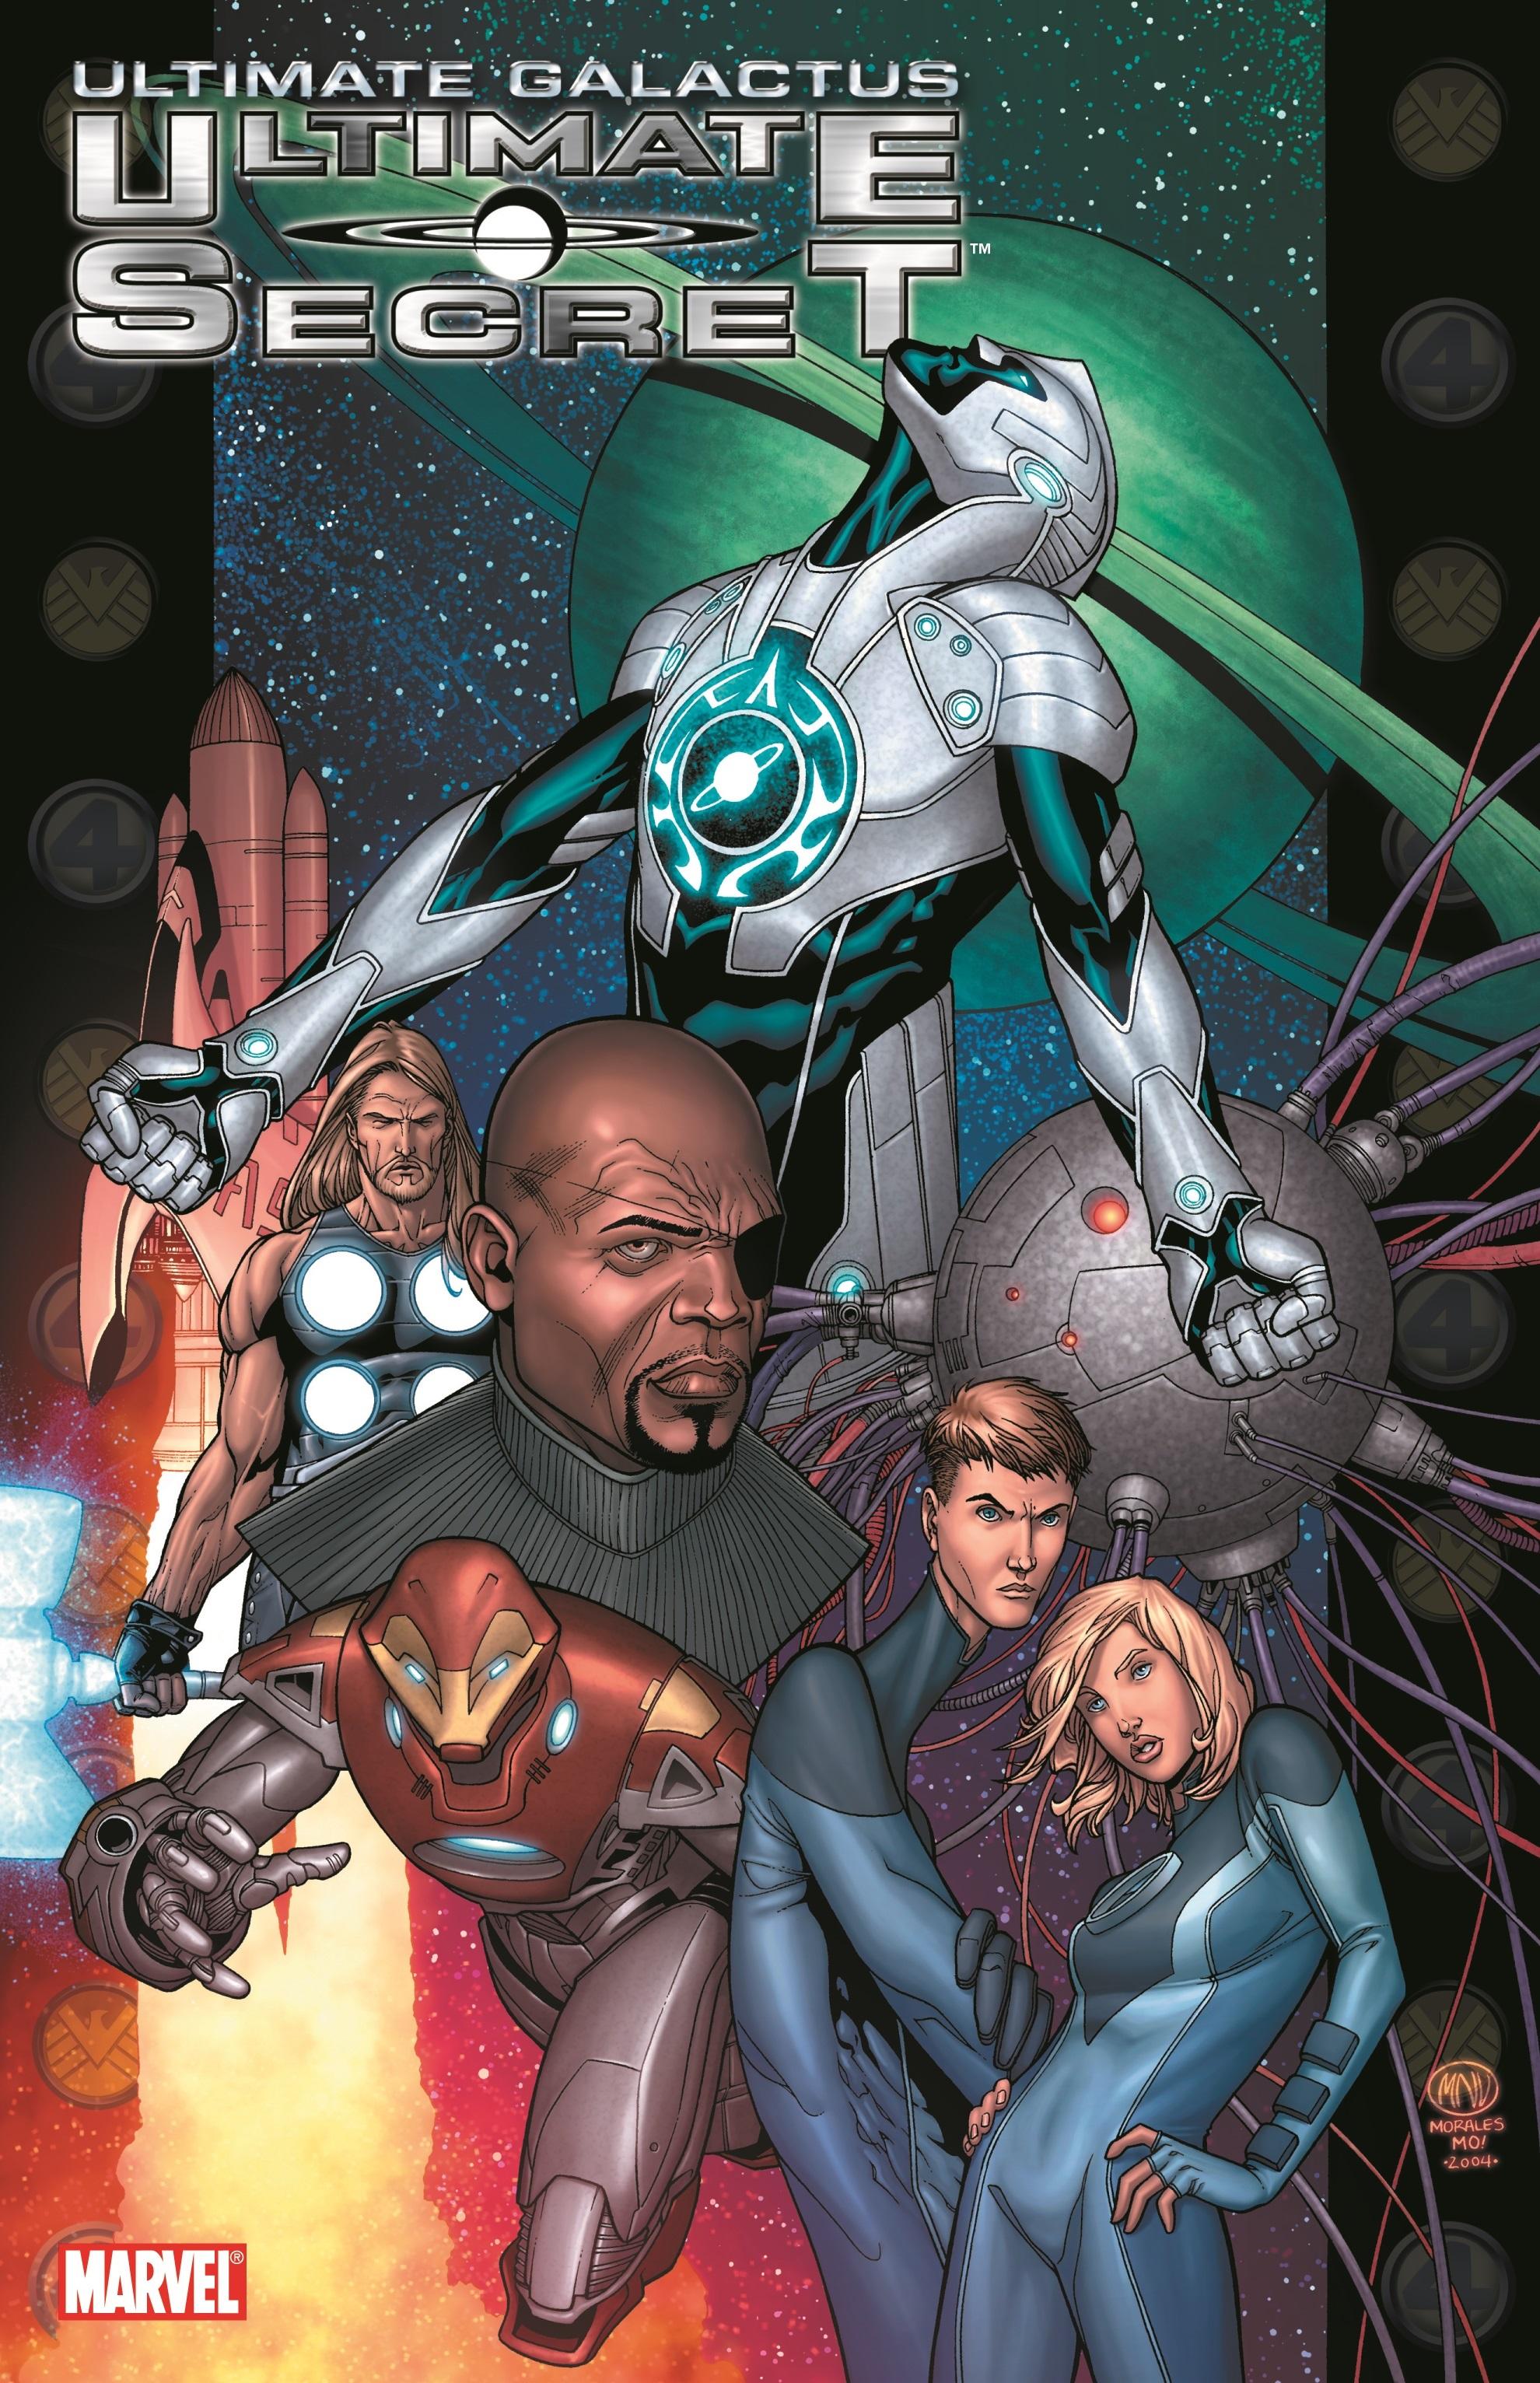 Ultimate Galactus Book 2: Secret (Trade Paperback)